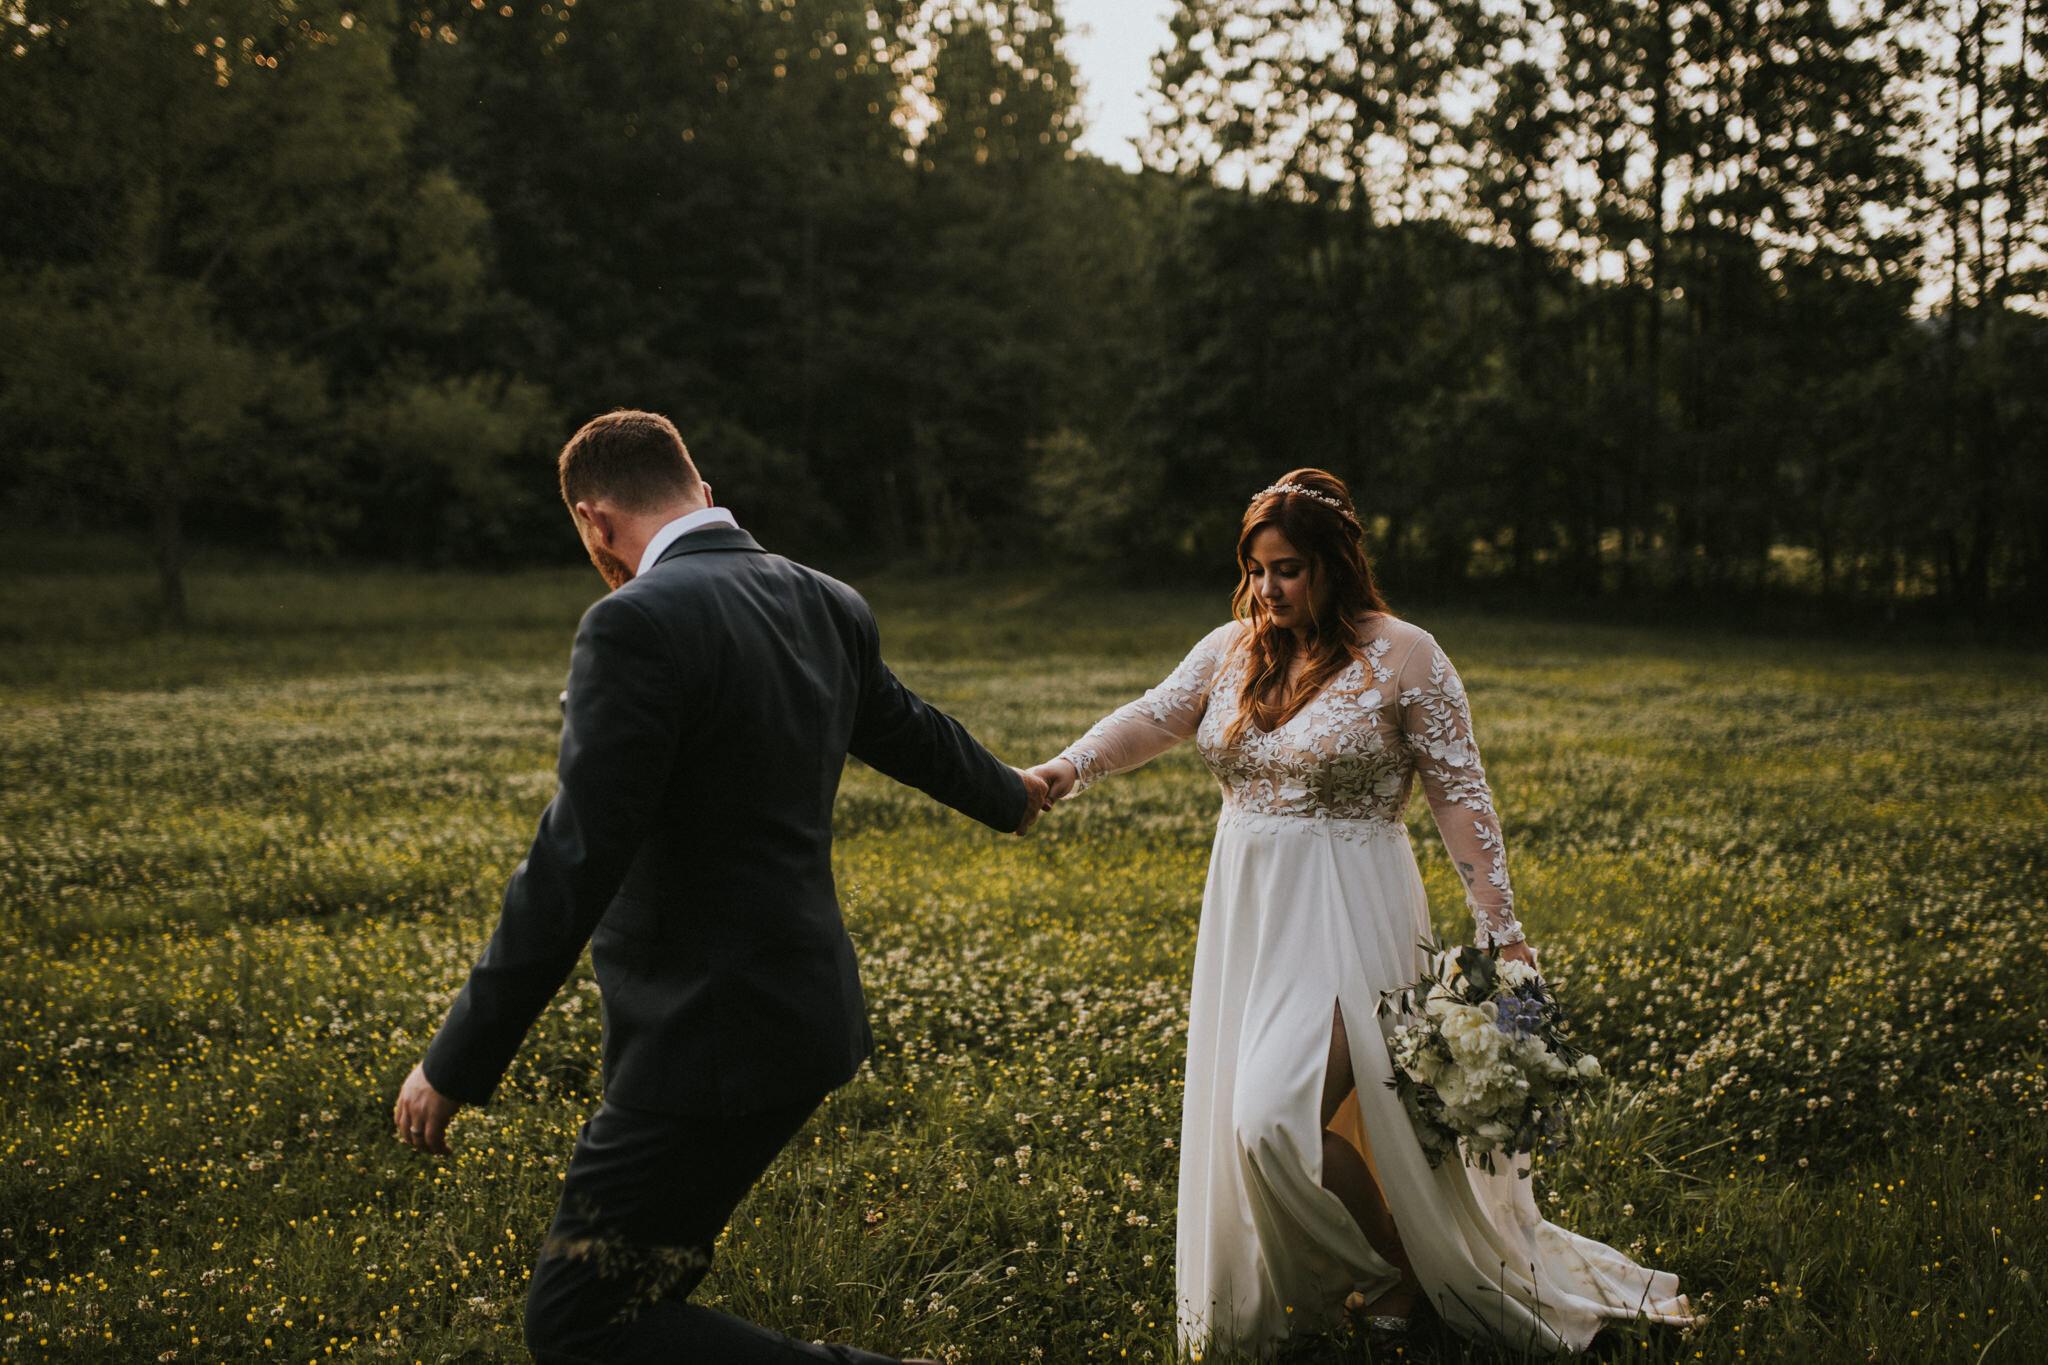 KateMatt-North-Georgia-Wedding-Photographer-Mountain-Laurel-Farm-137.jpg